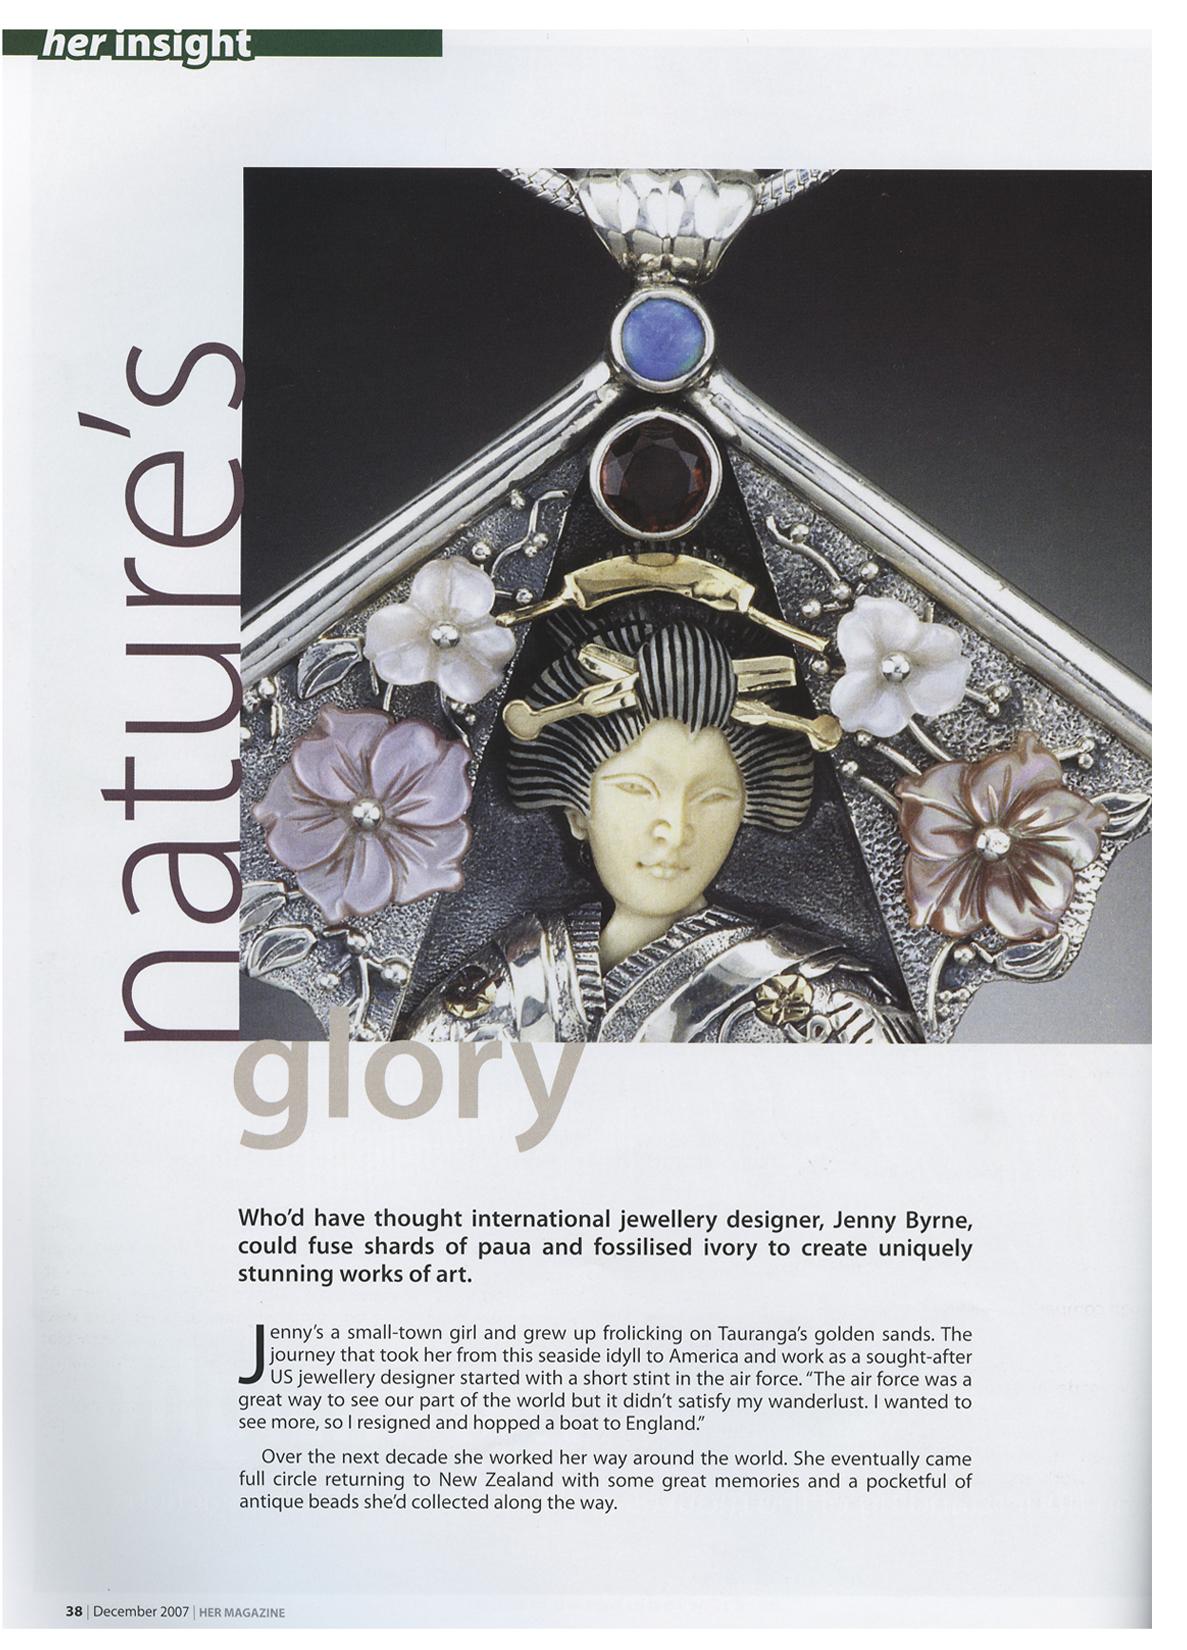 Zealandia jewelry, Jenny Byrne article 1